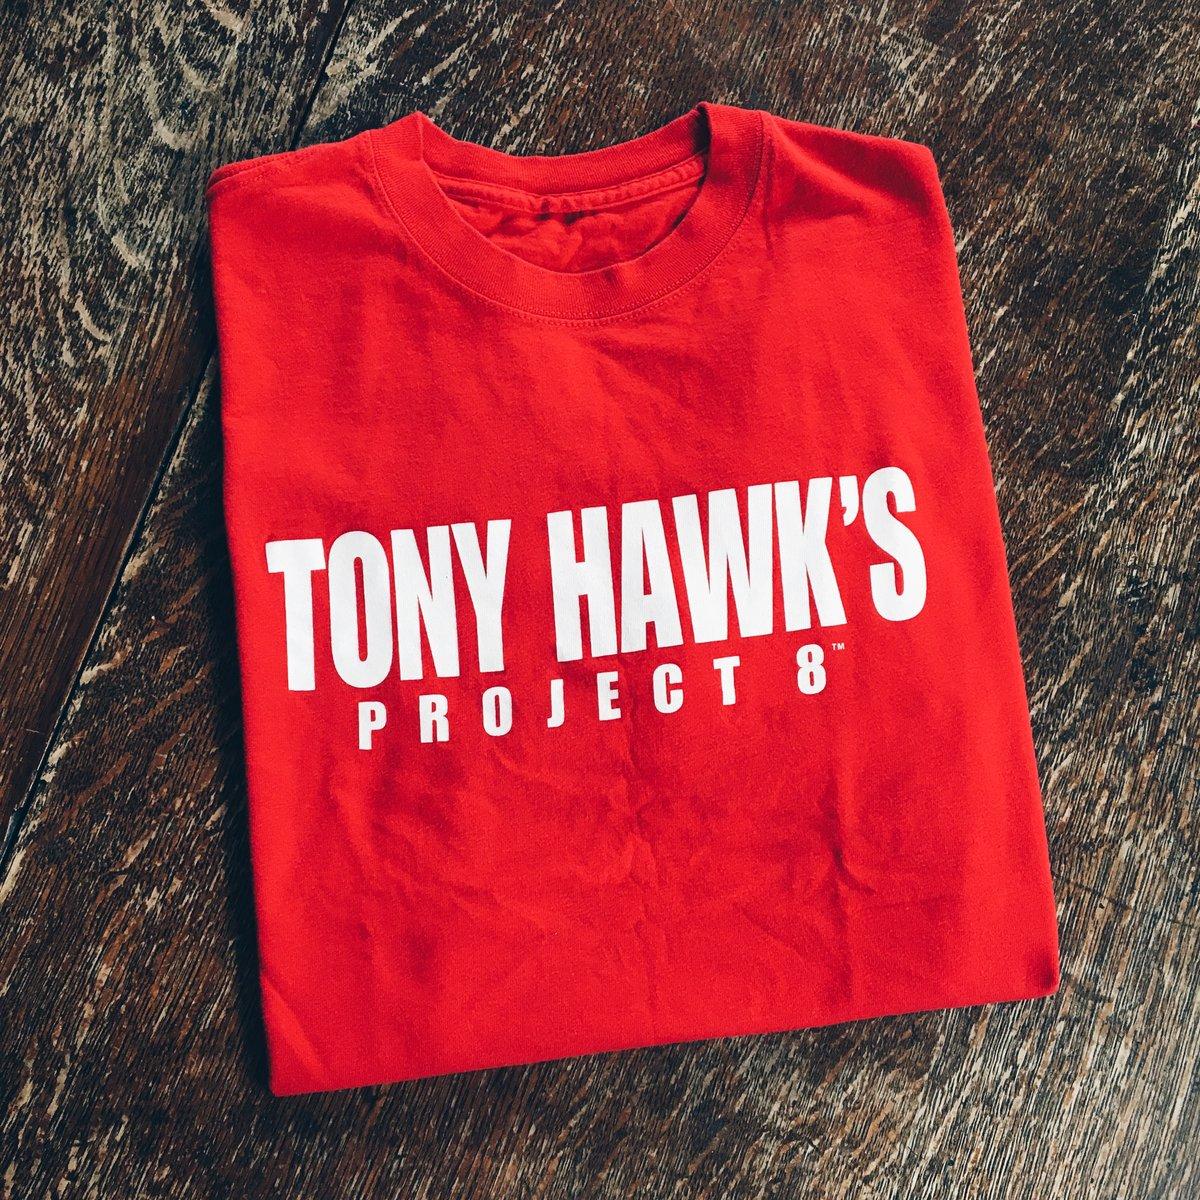 Image of Original 2006 Tony's Hawks Project 8 Video Game Promo Tee.